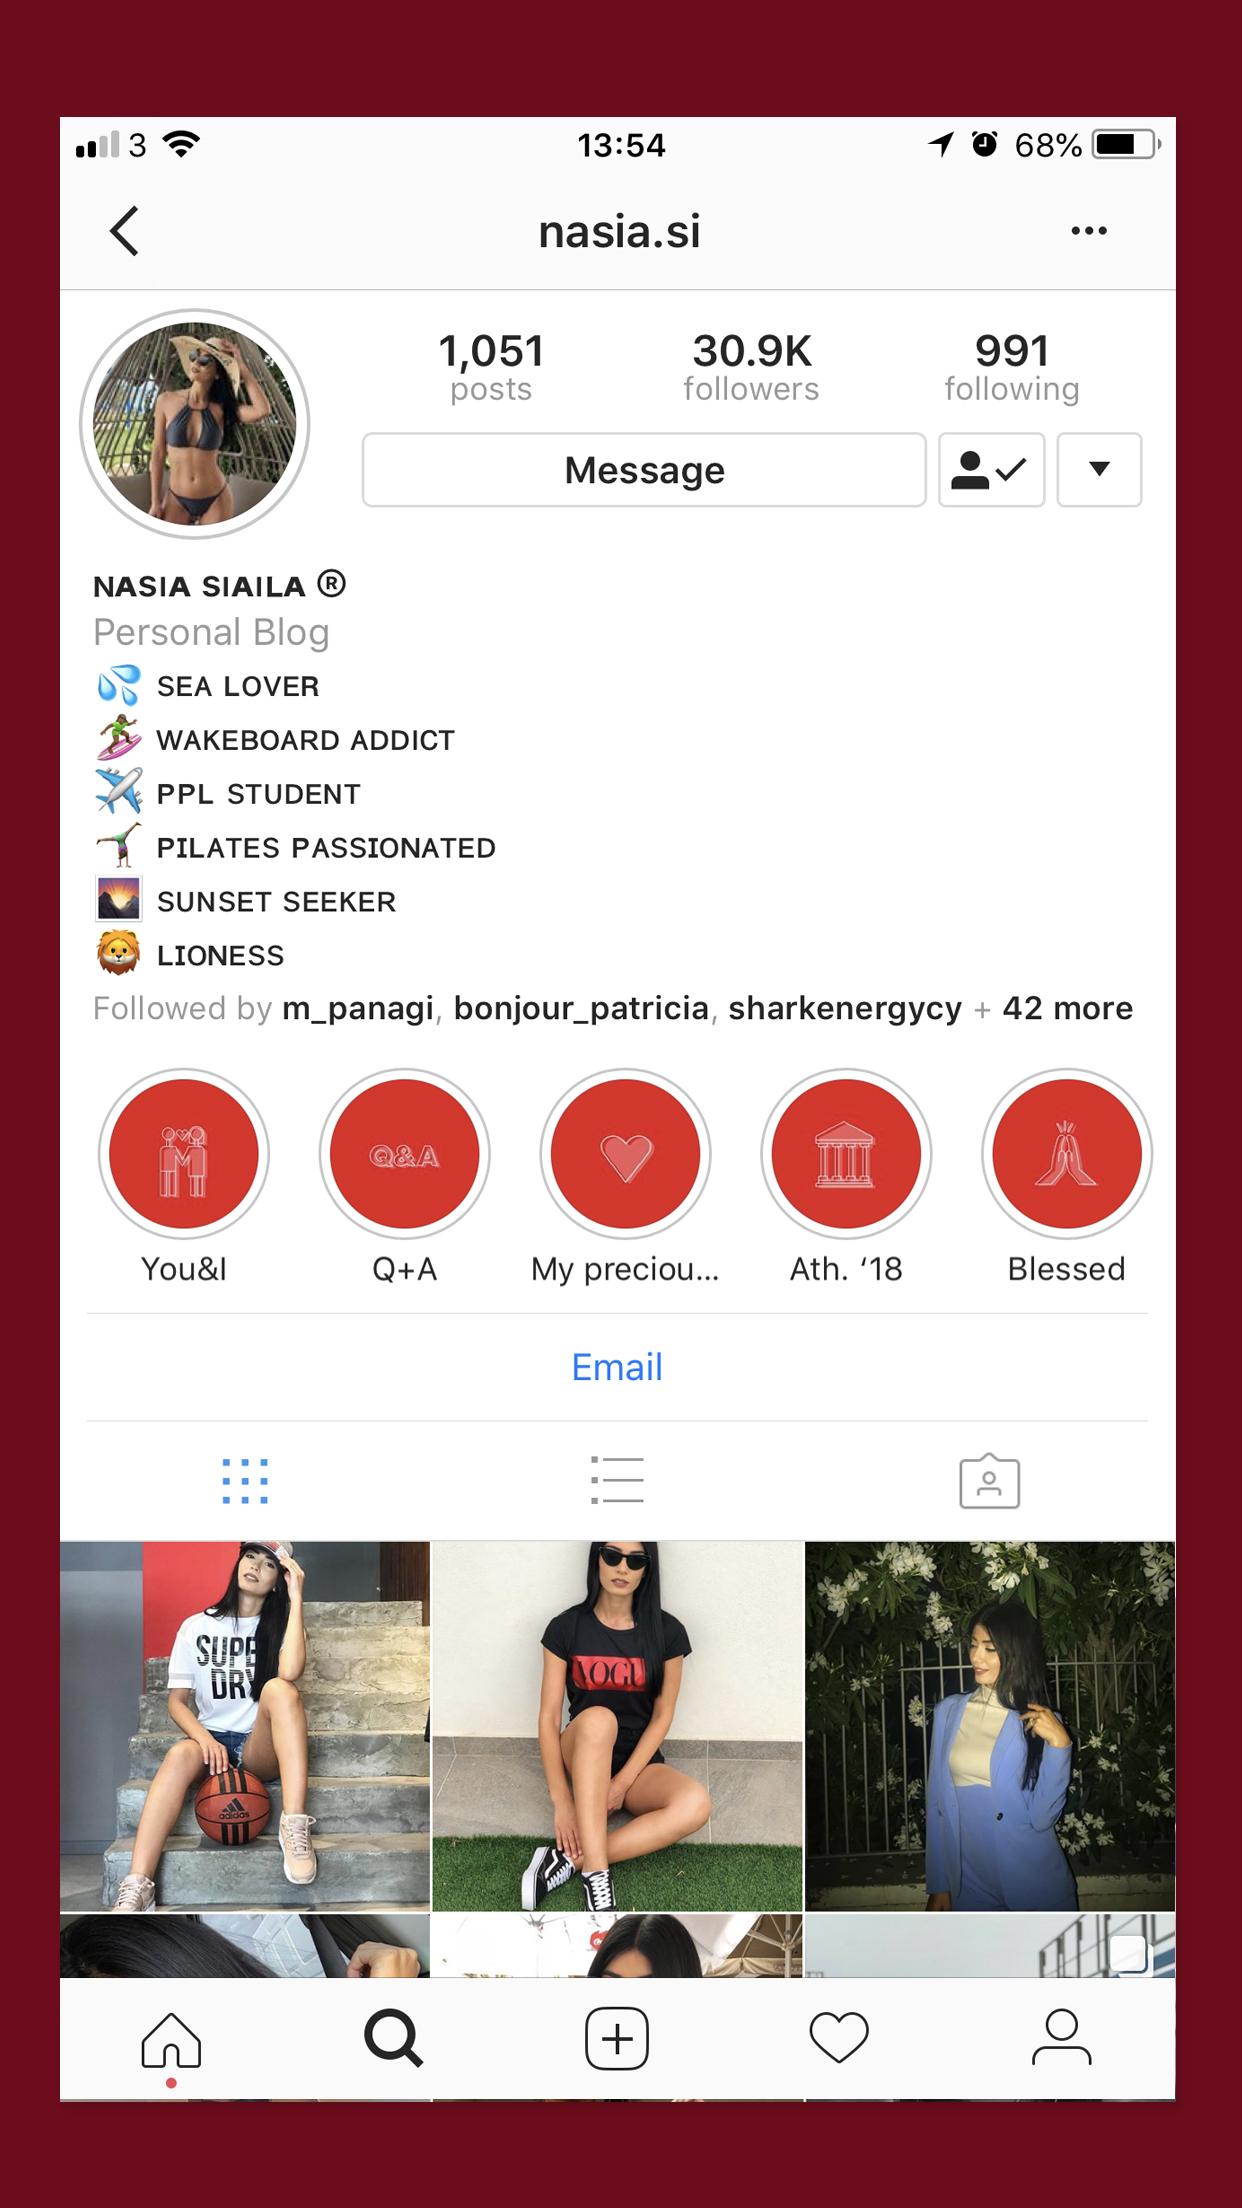 nasia_icons.jpg